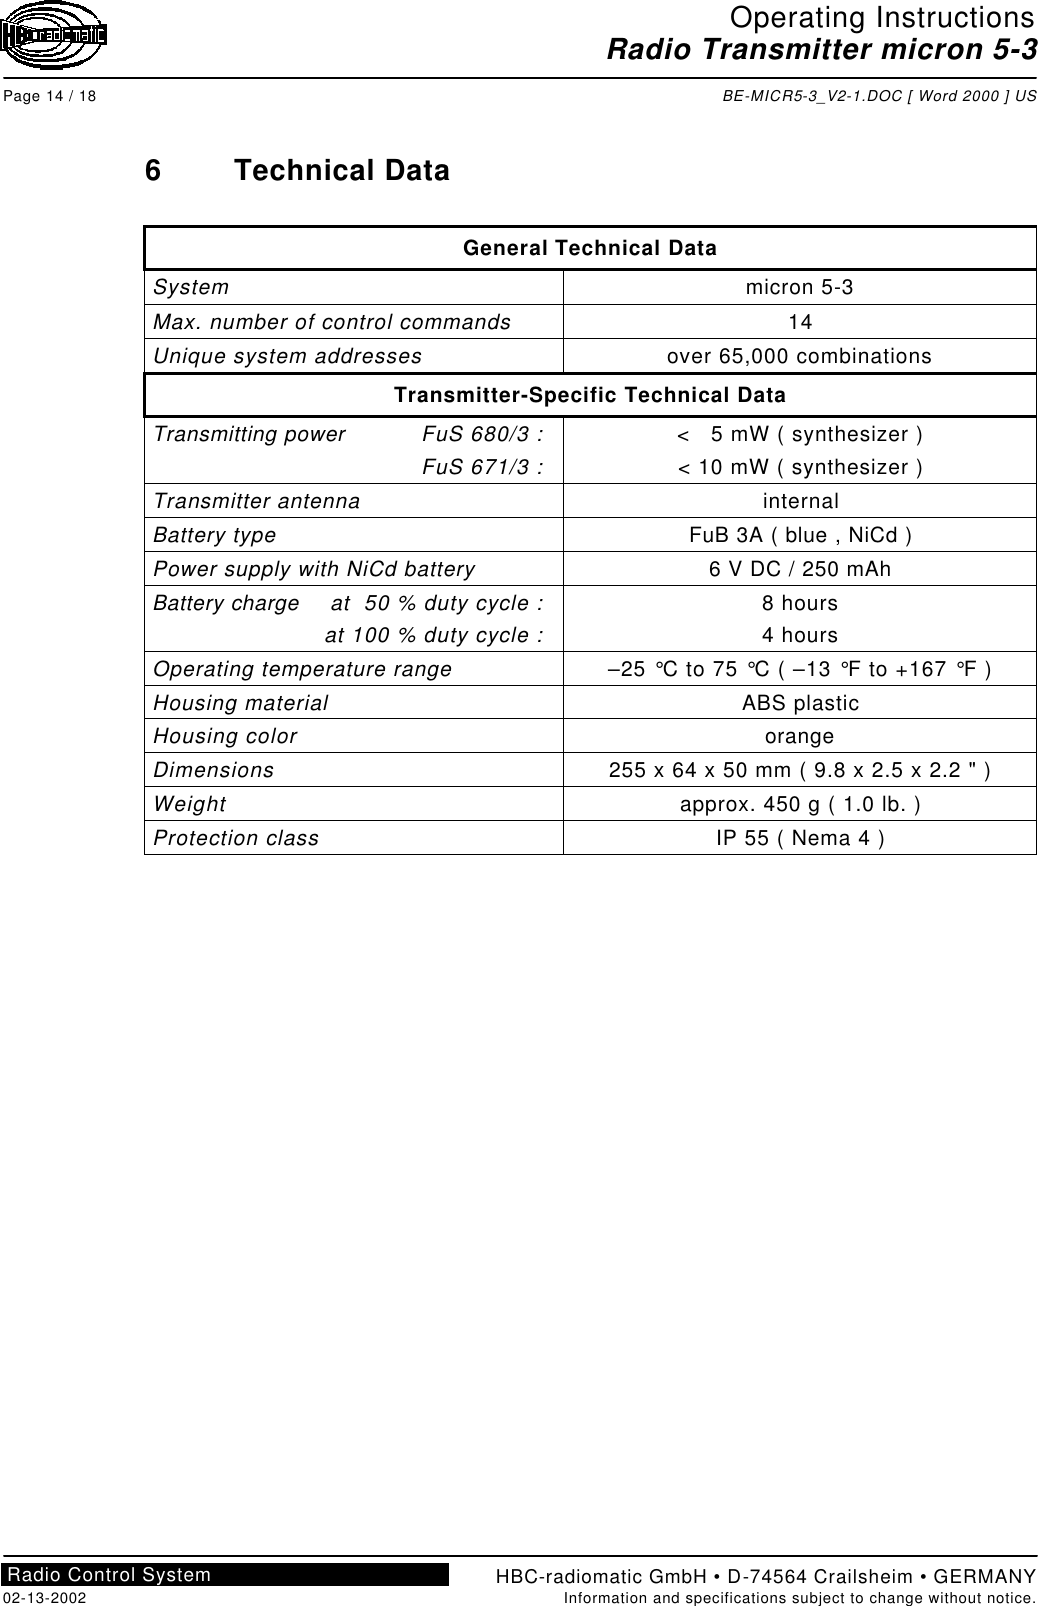 HBC radiomatic M50004 Micron 5 User Manual BE MICR5 3 V2 1